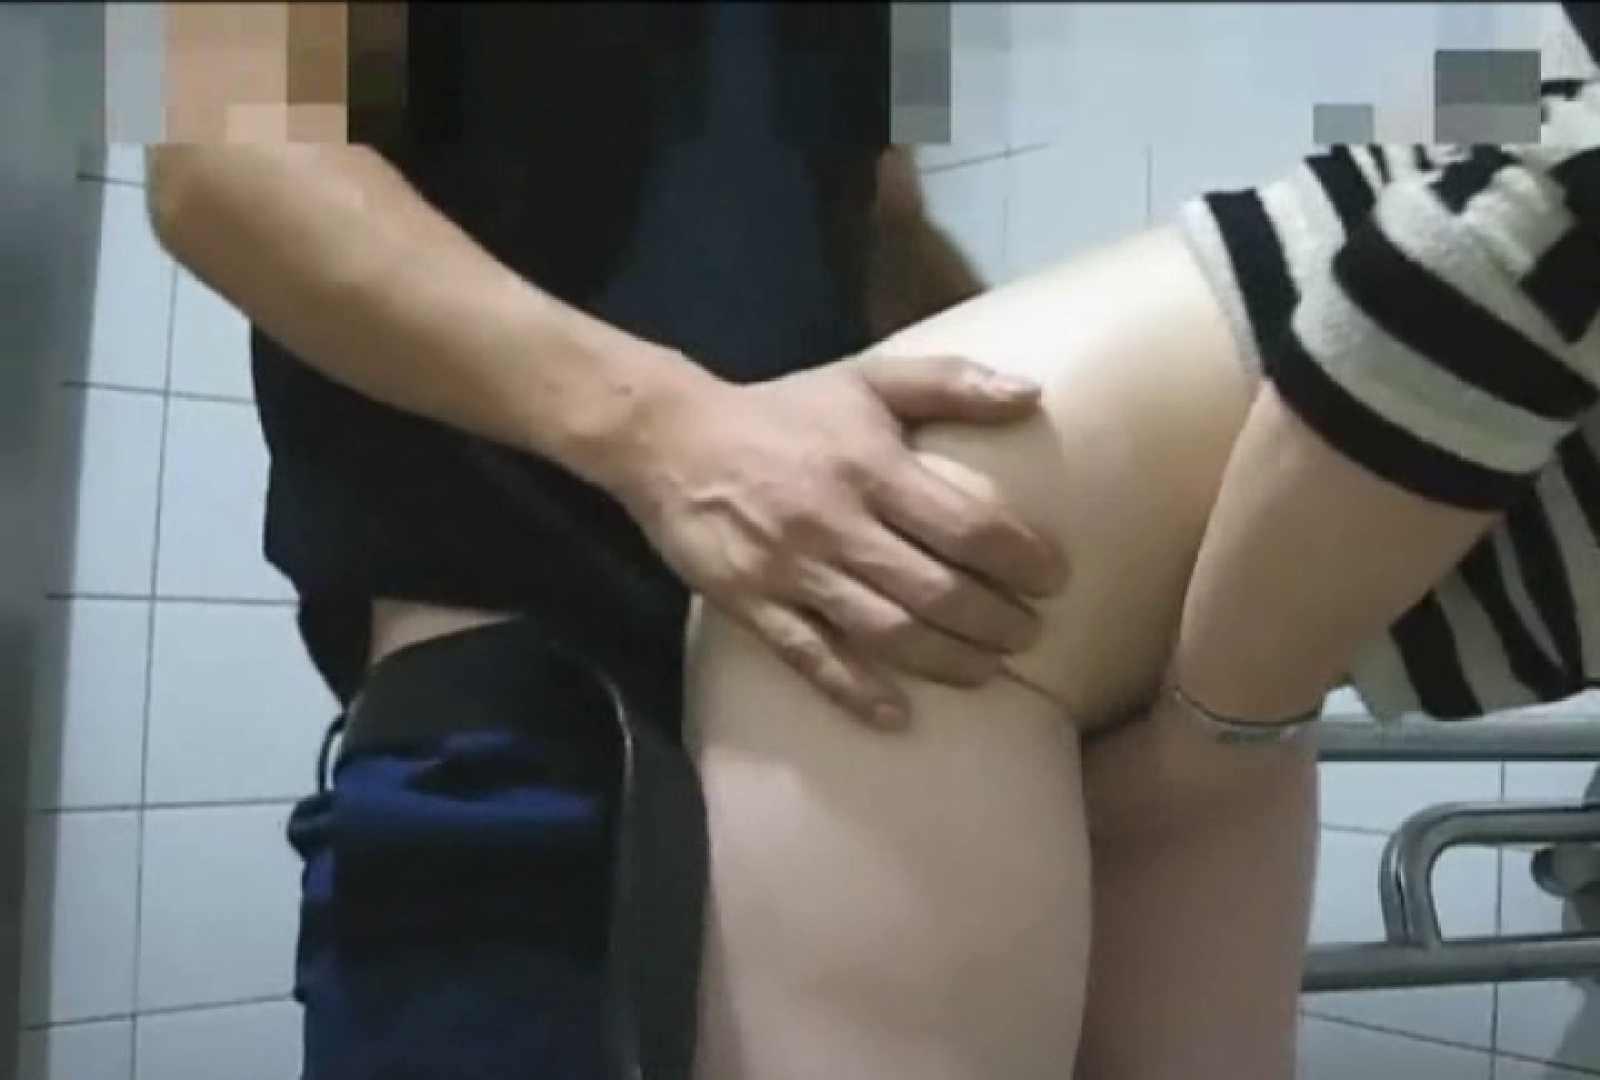 supe〇oneba〇esさんの個人撮影 vol.02 エロいOL セックス無修正動画無料 75枚